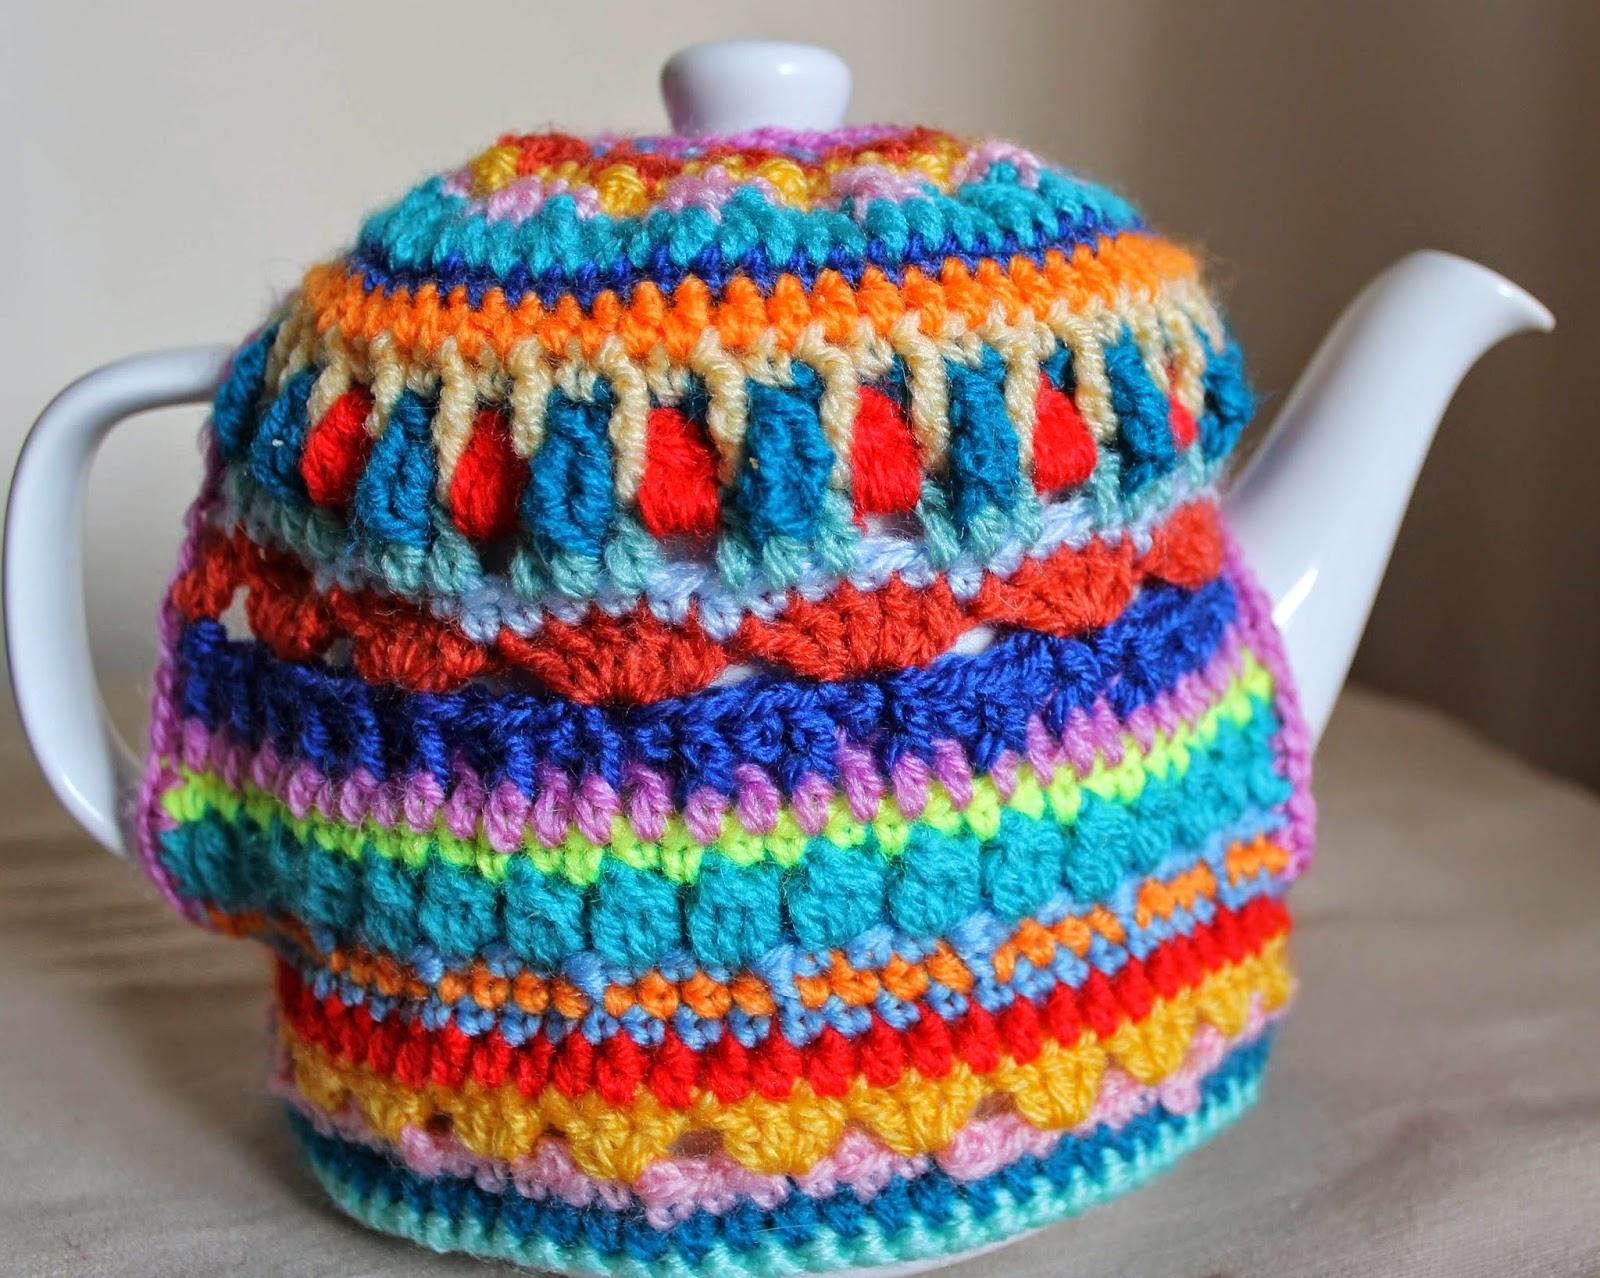 colourful crochet tea cosy || www.embellishedelephant.blogspot.co.uk